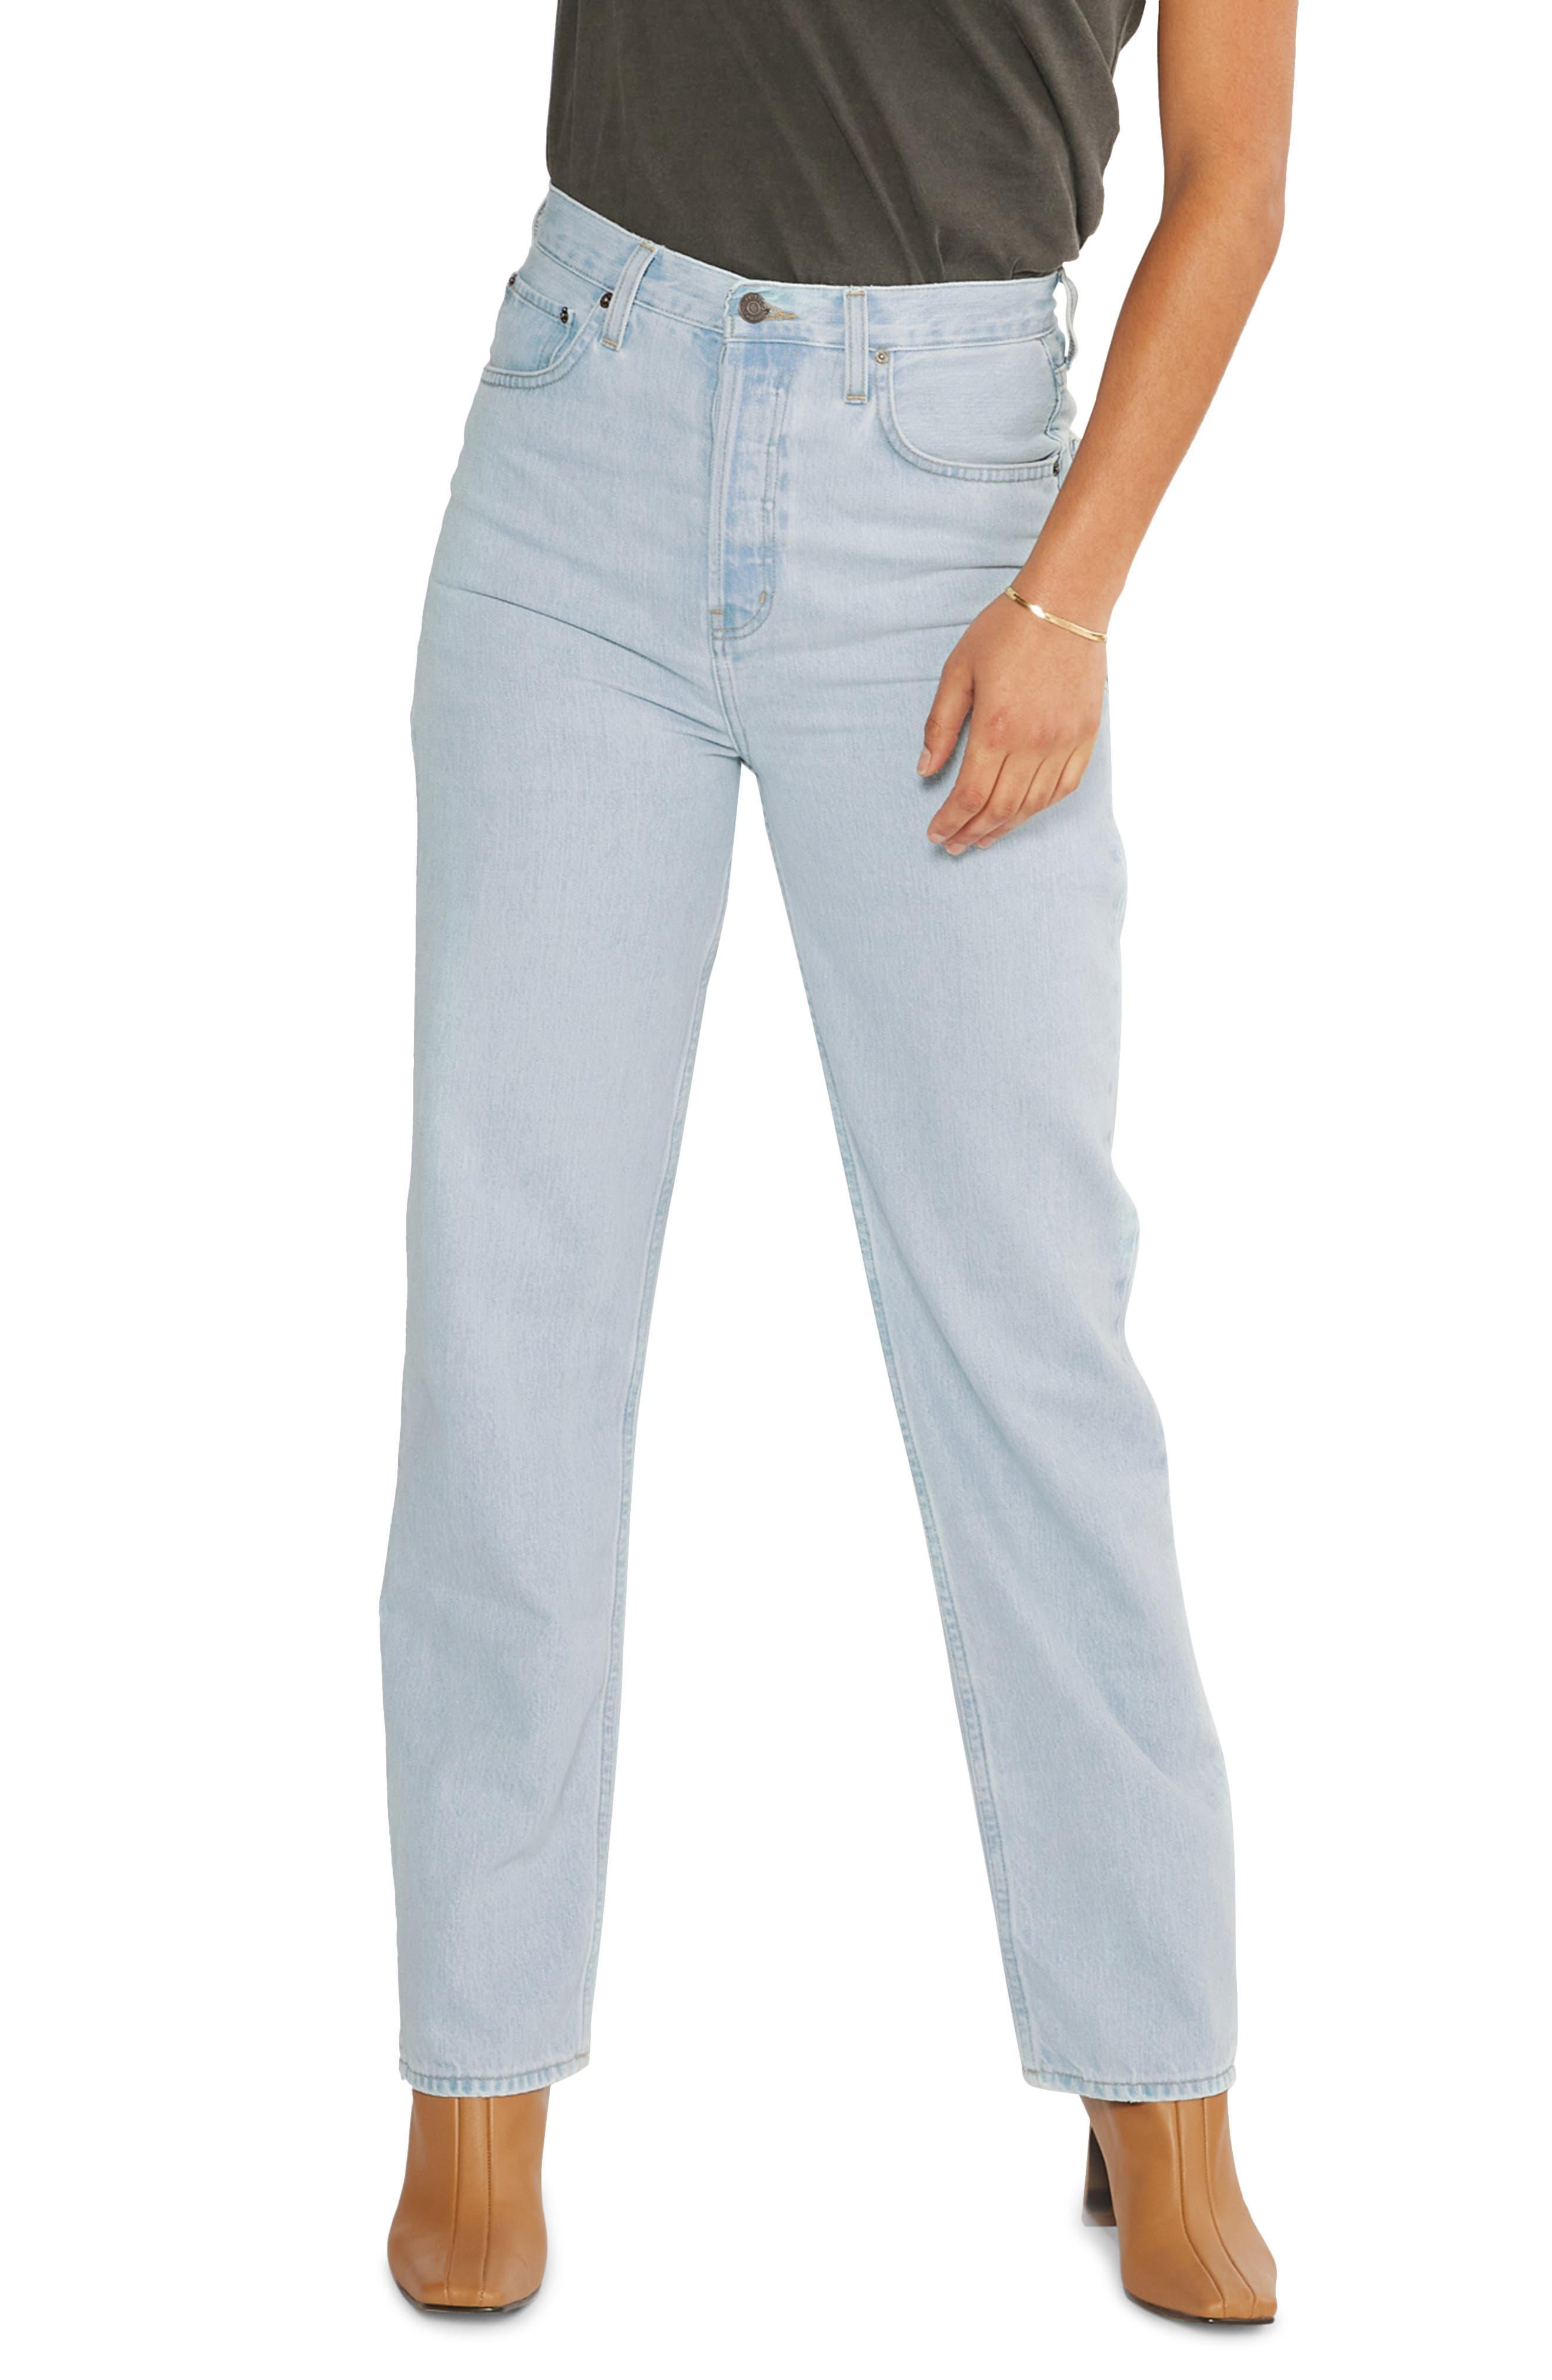 Women's Etica Carine Super High Waist Straight Leg Jeans